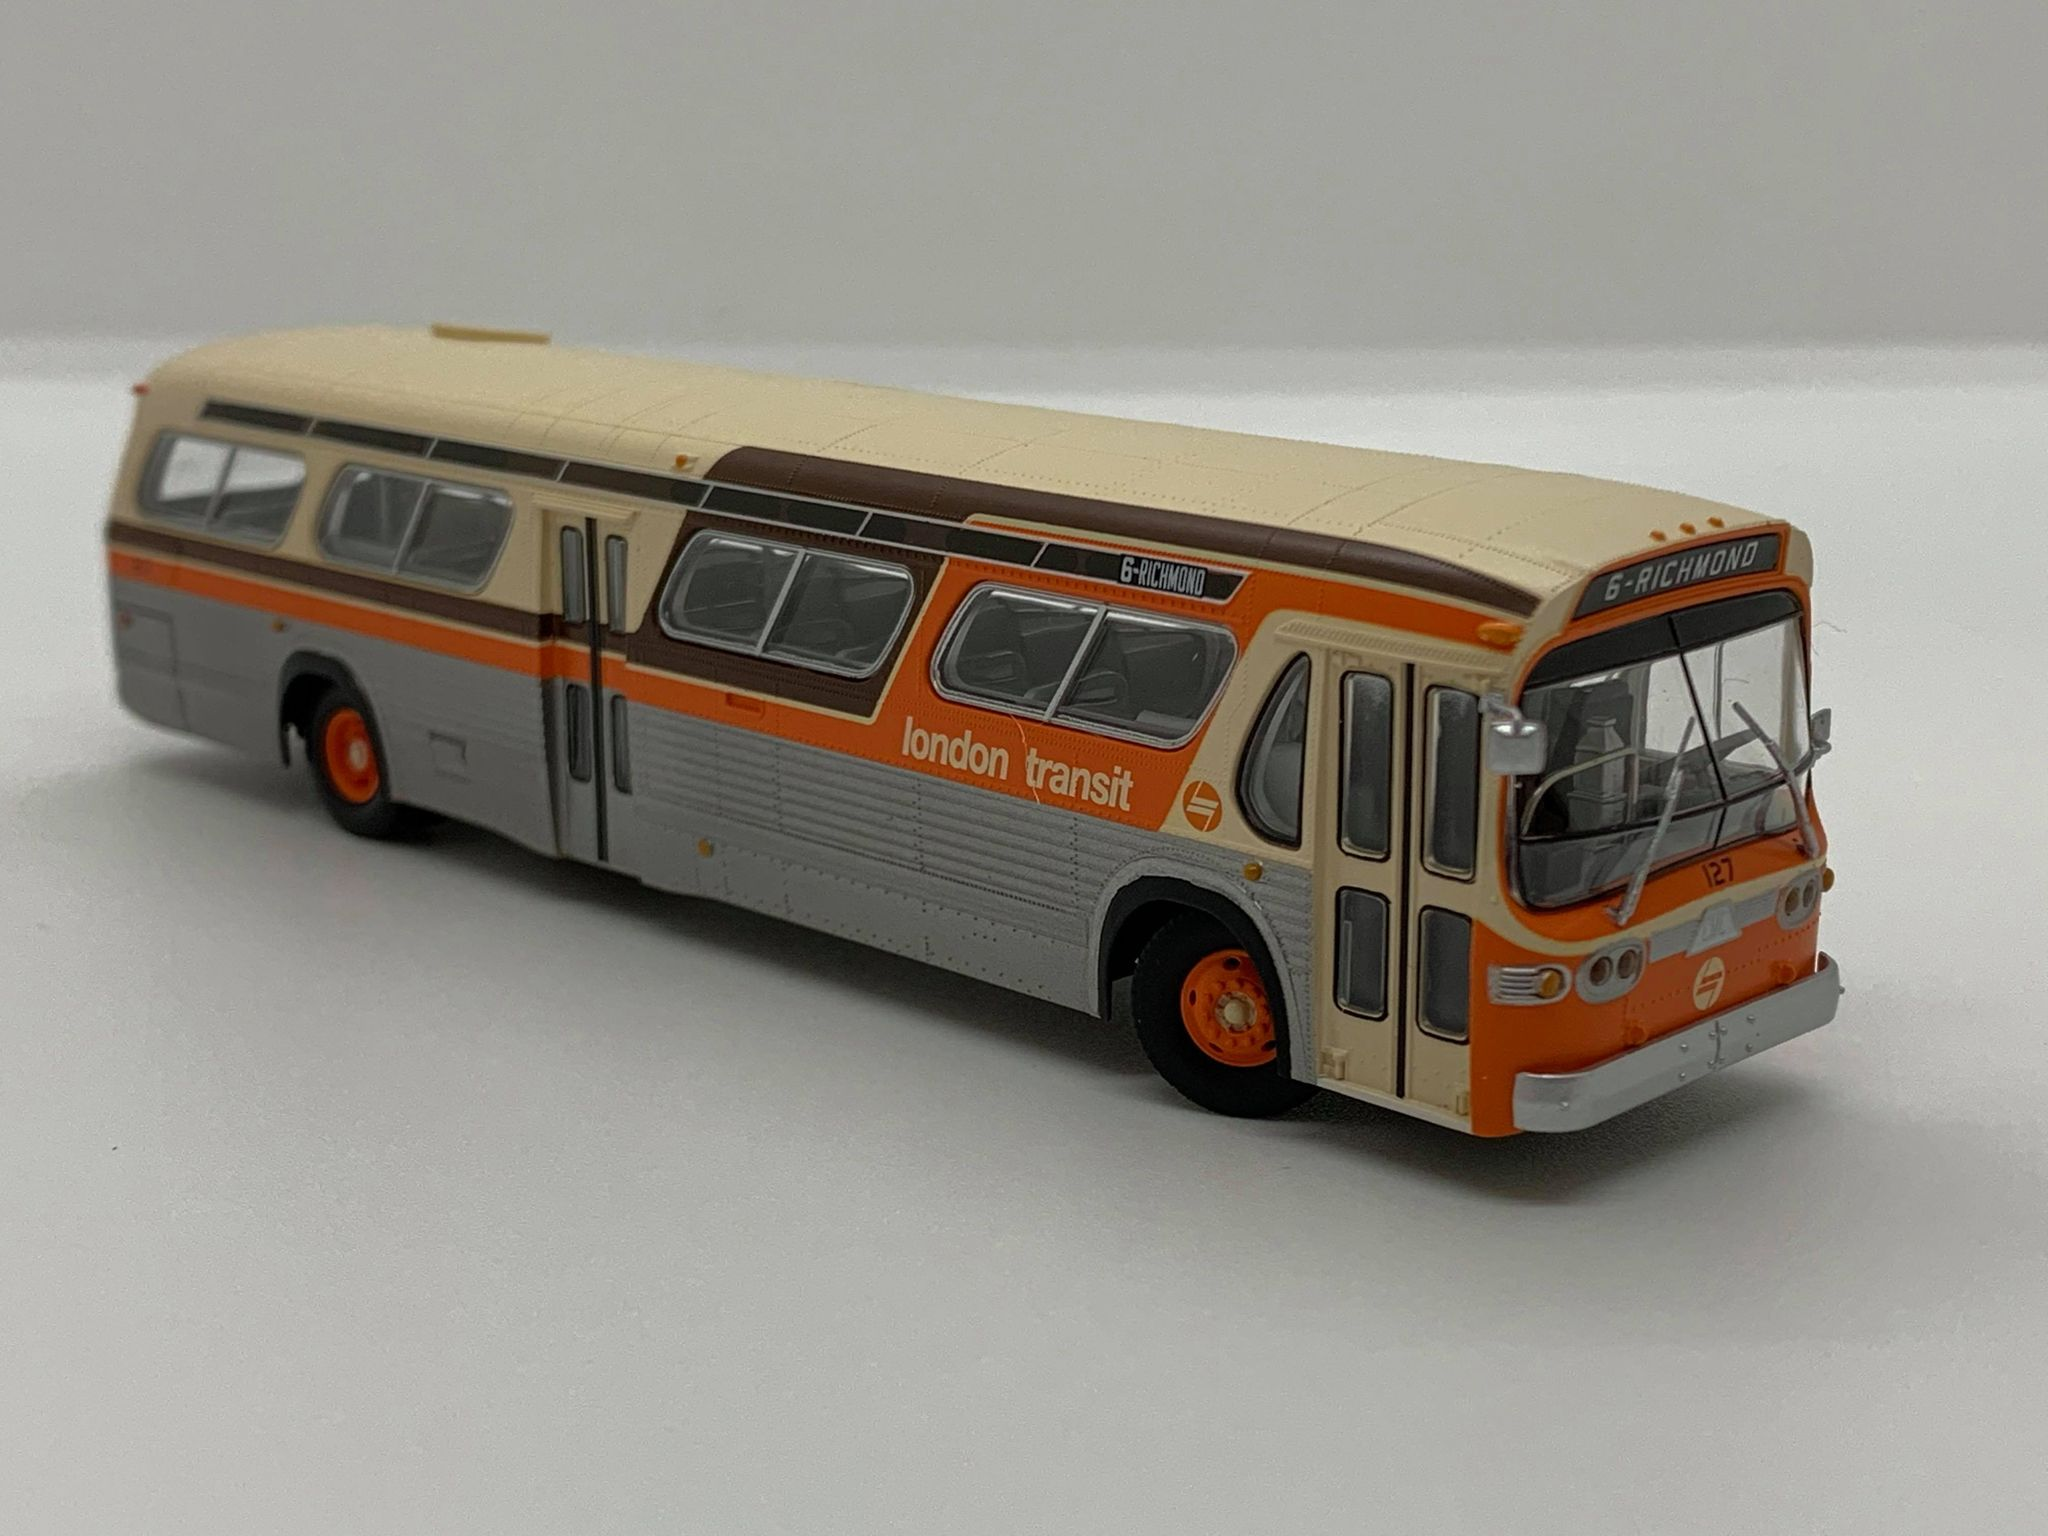 Rapido Trains 753092 HO New Look Bus Exclusive London Transit Commission (Orange/Brown)#127 6 - Richmond Deluxe